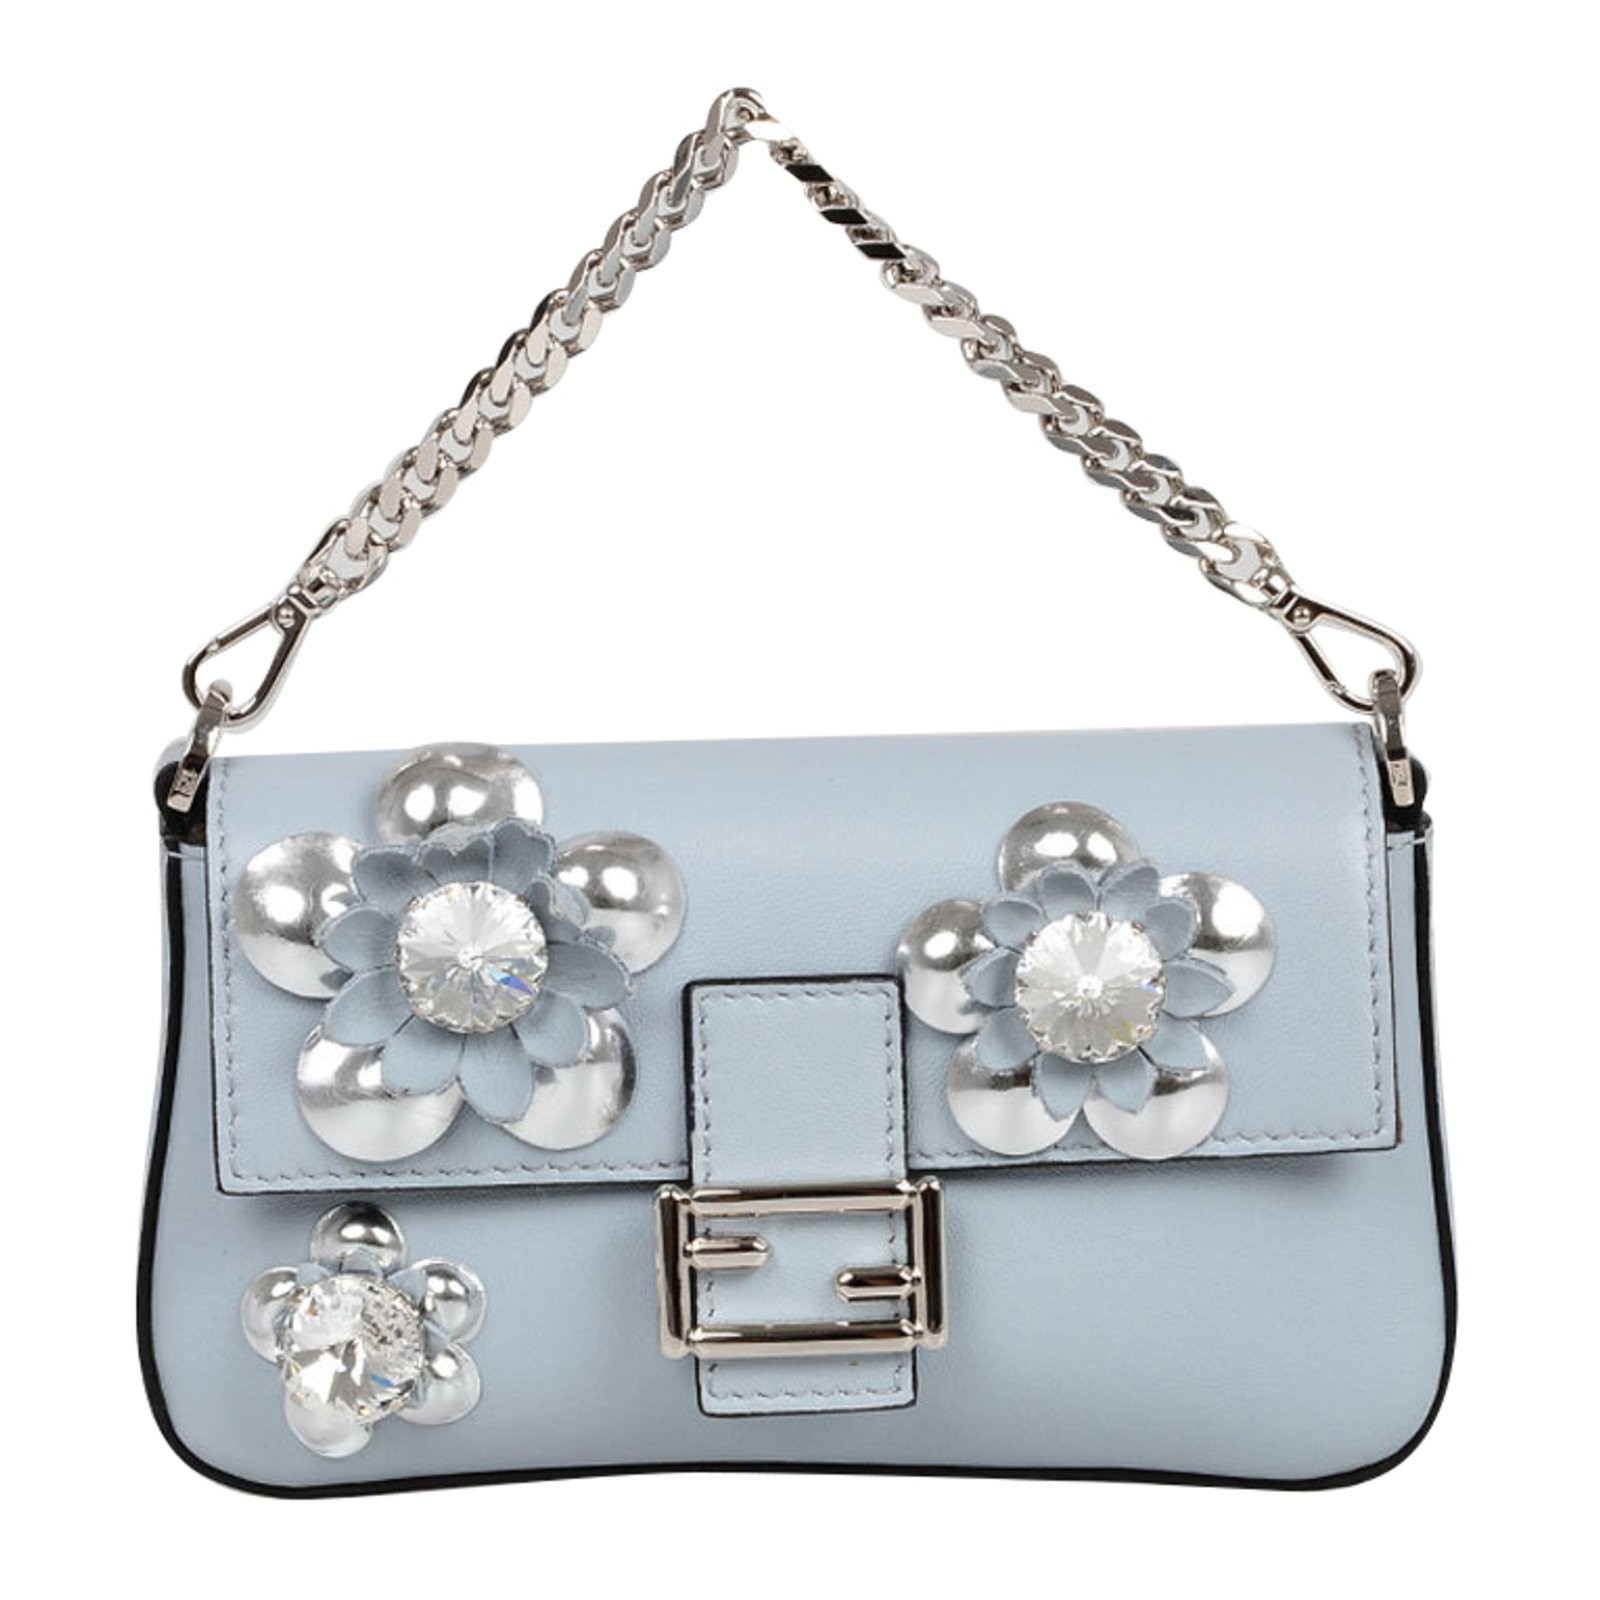 b07f9c0f6a Fendi Handbags Handbags Leather Blue ref.75904 - Joli Closet